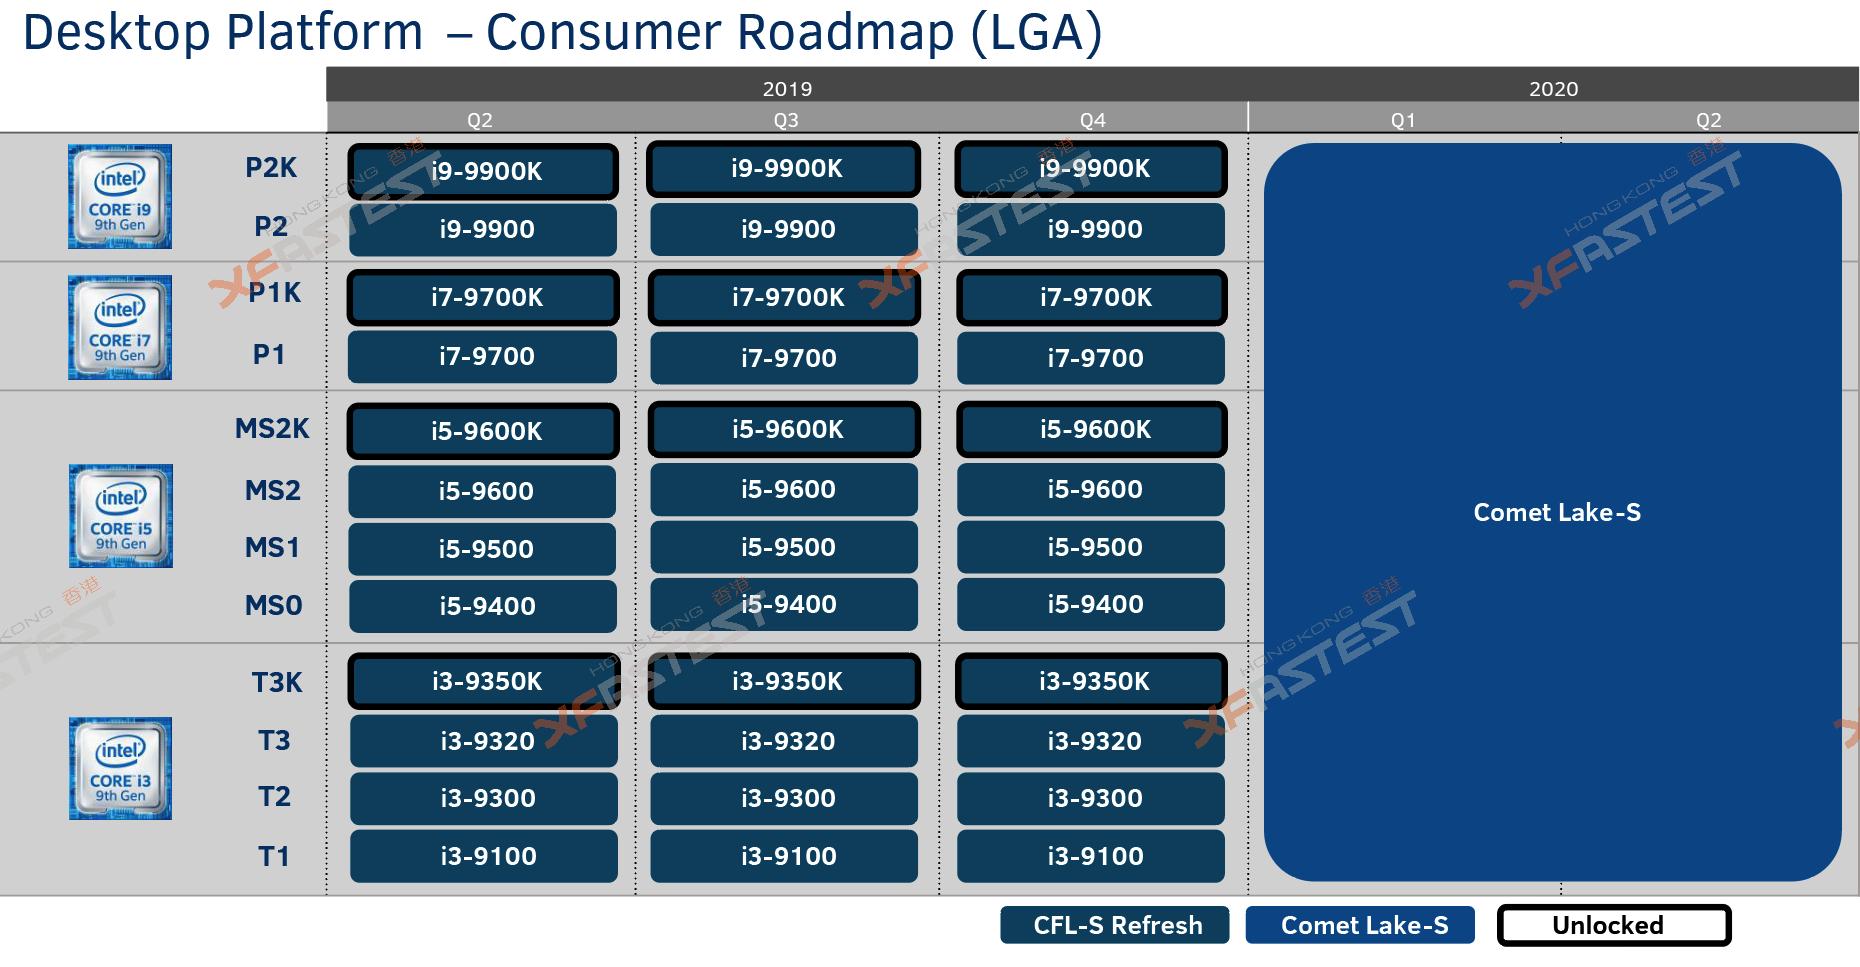 New Year Comet 2020 Intel 10th Gen Comet Lake S Desktop CPUs in 2020 on LGA 1200 Socket